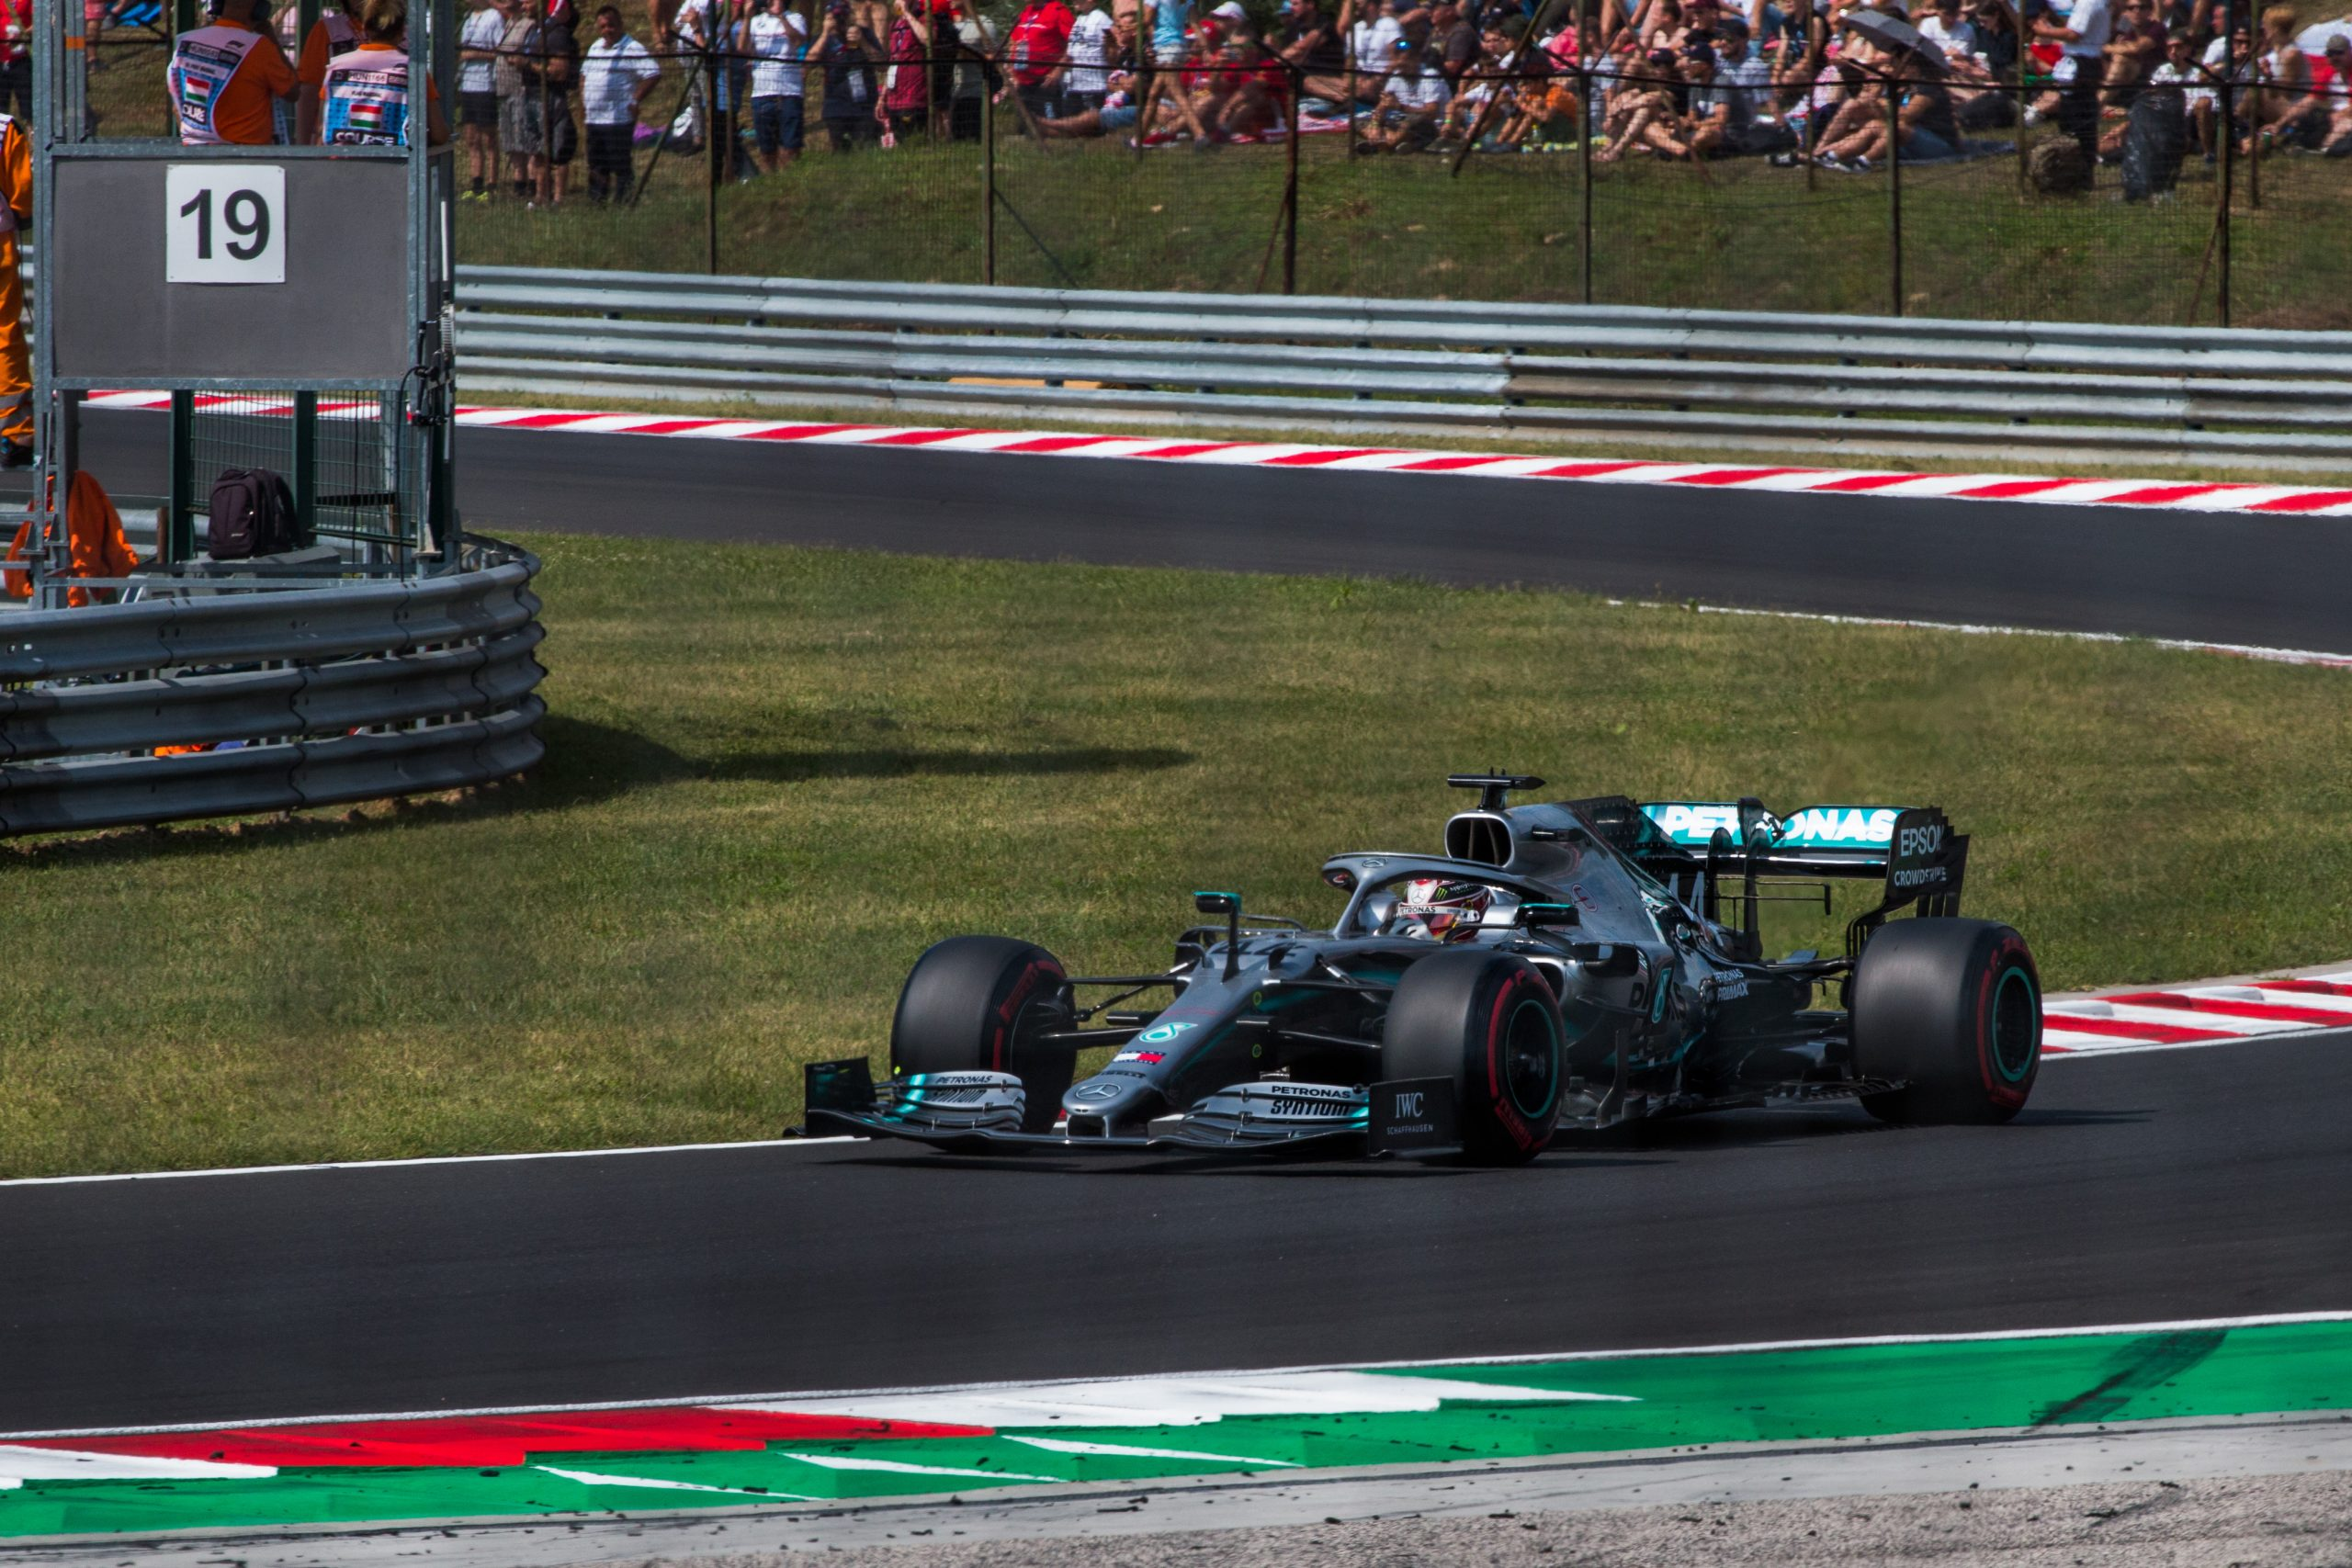 Formule 1 Oostenrijk – Vijfdaagse vliegreis – Spielberg 2021